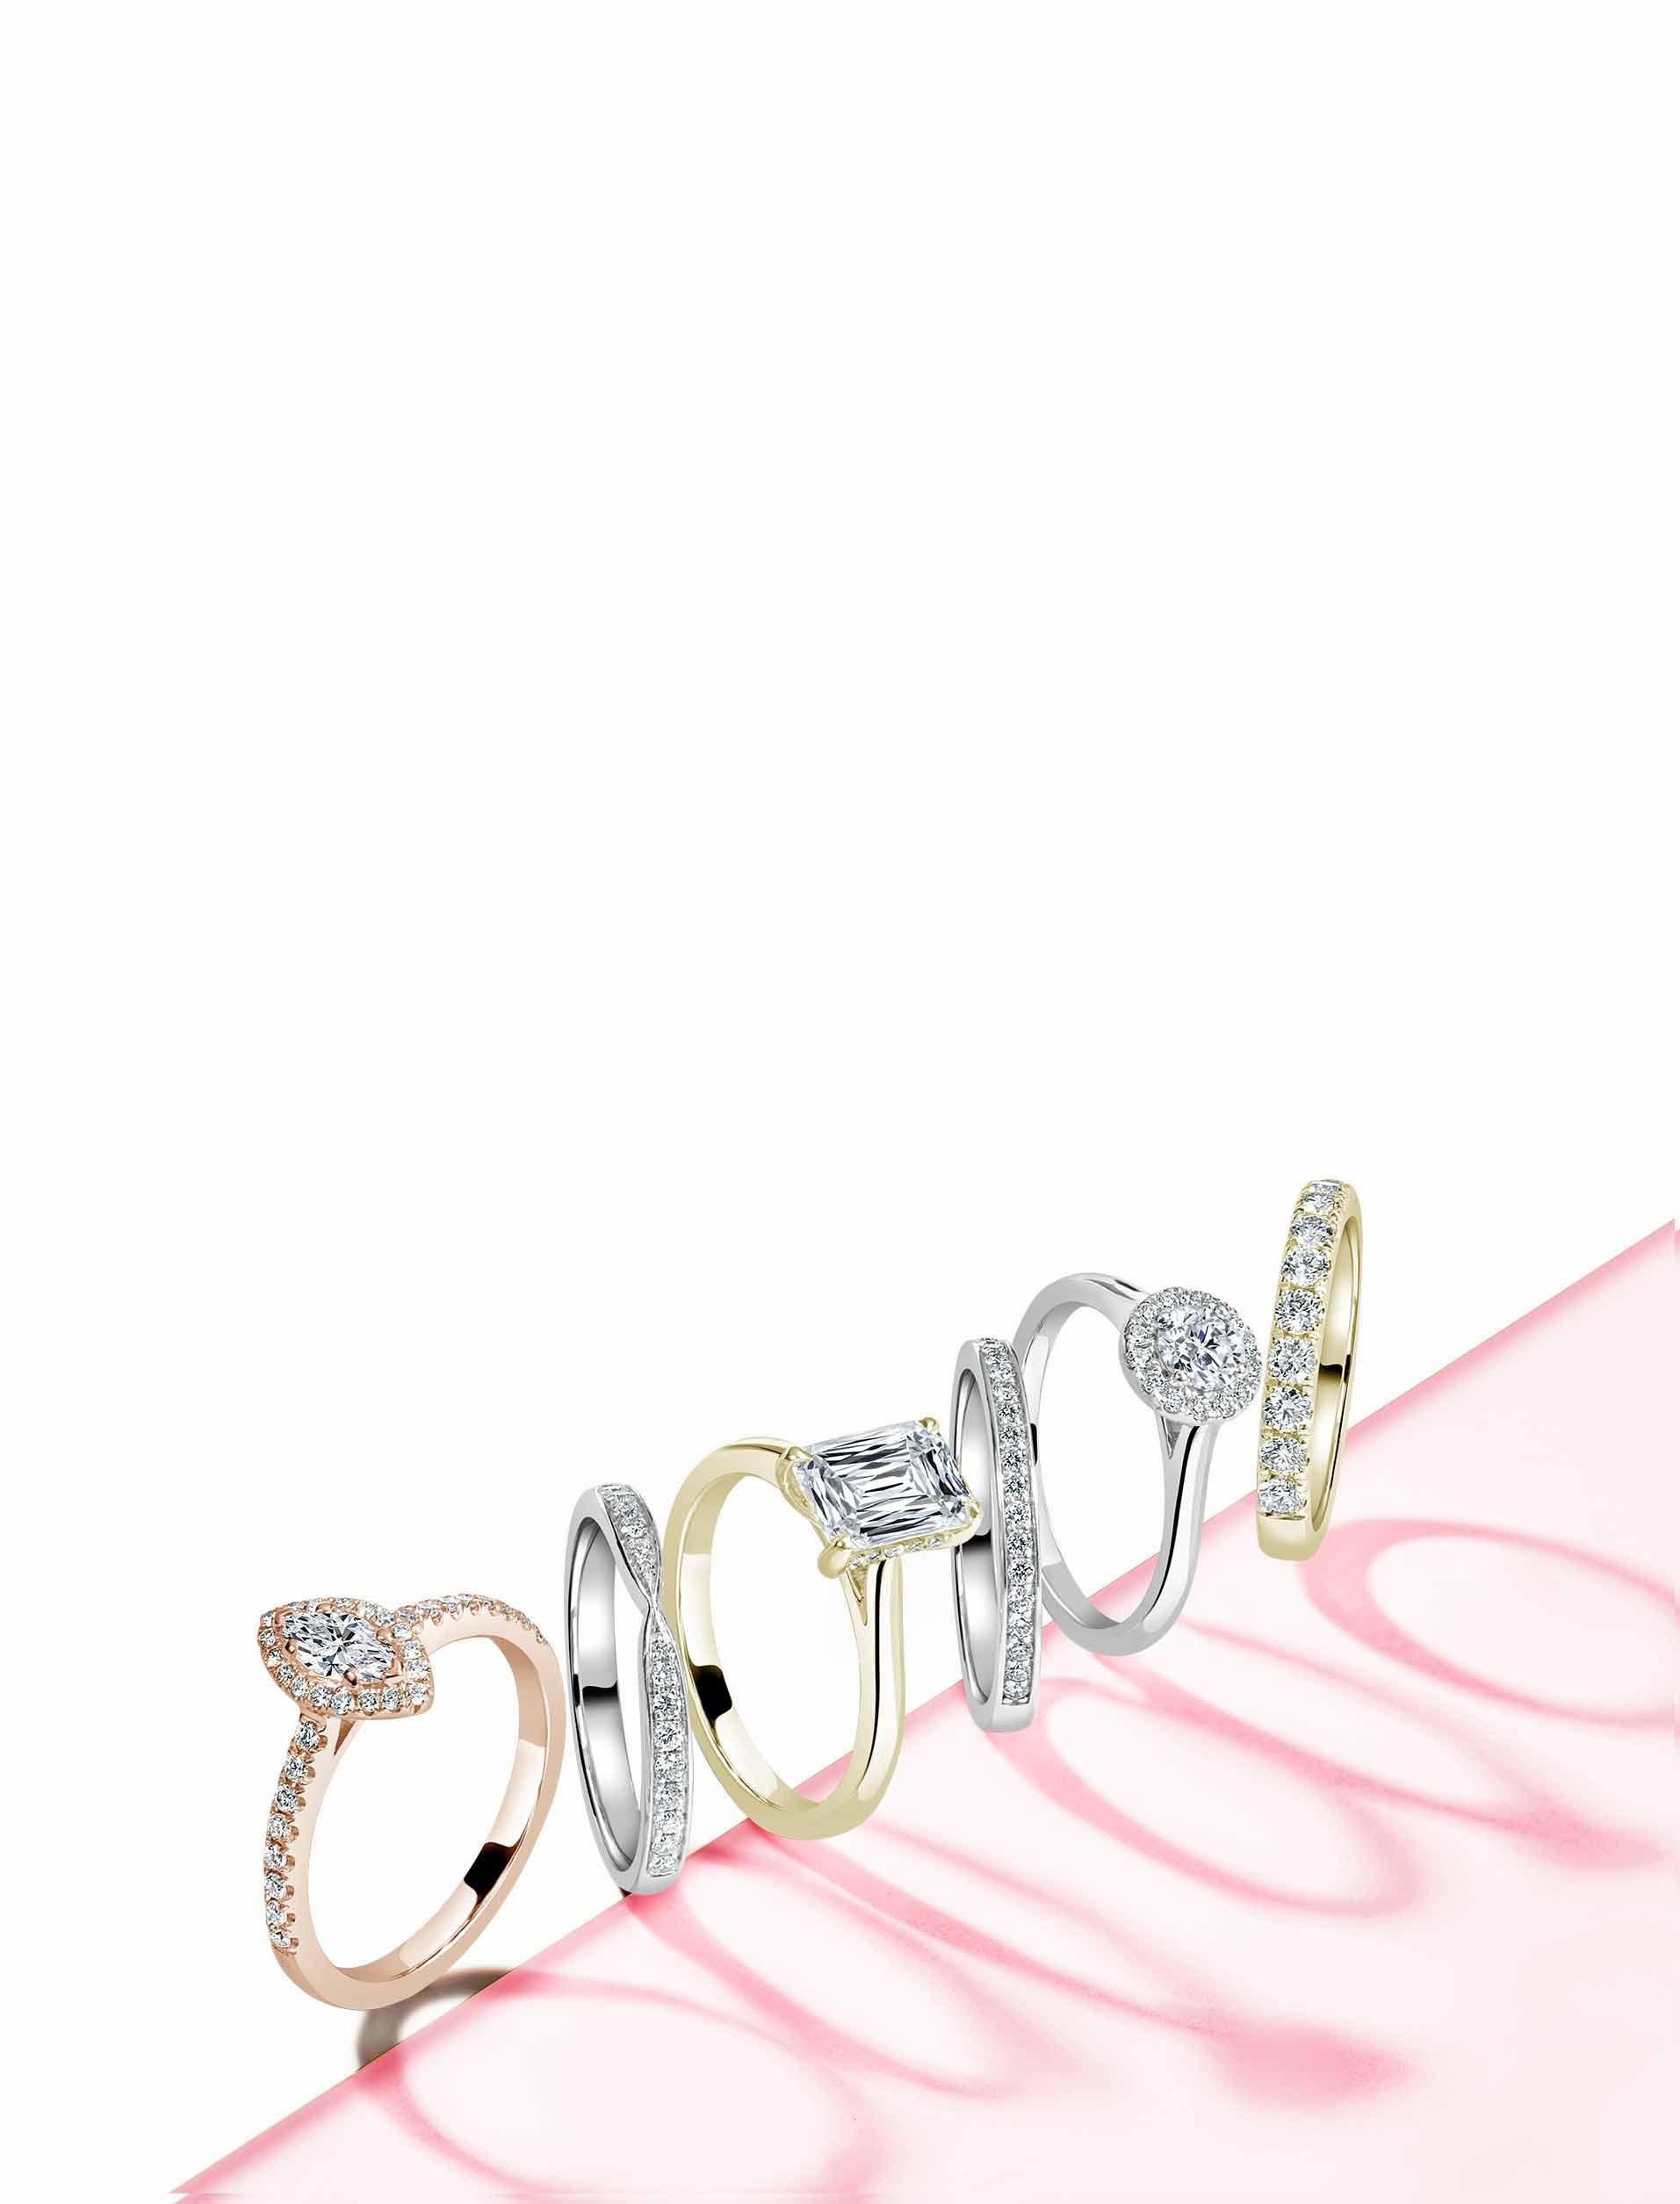 Round Brilliant Diamond Engagement Rings - Steven Stone